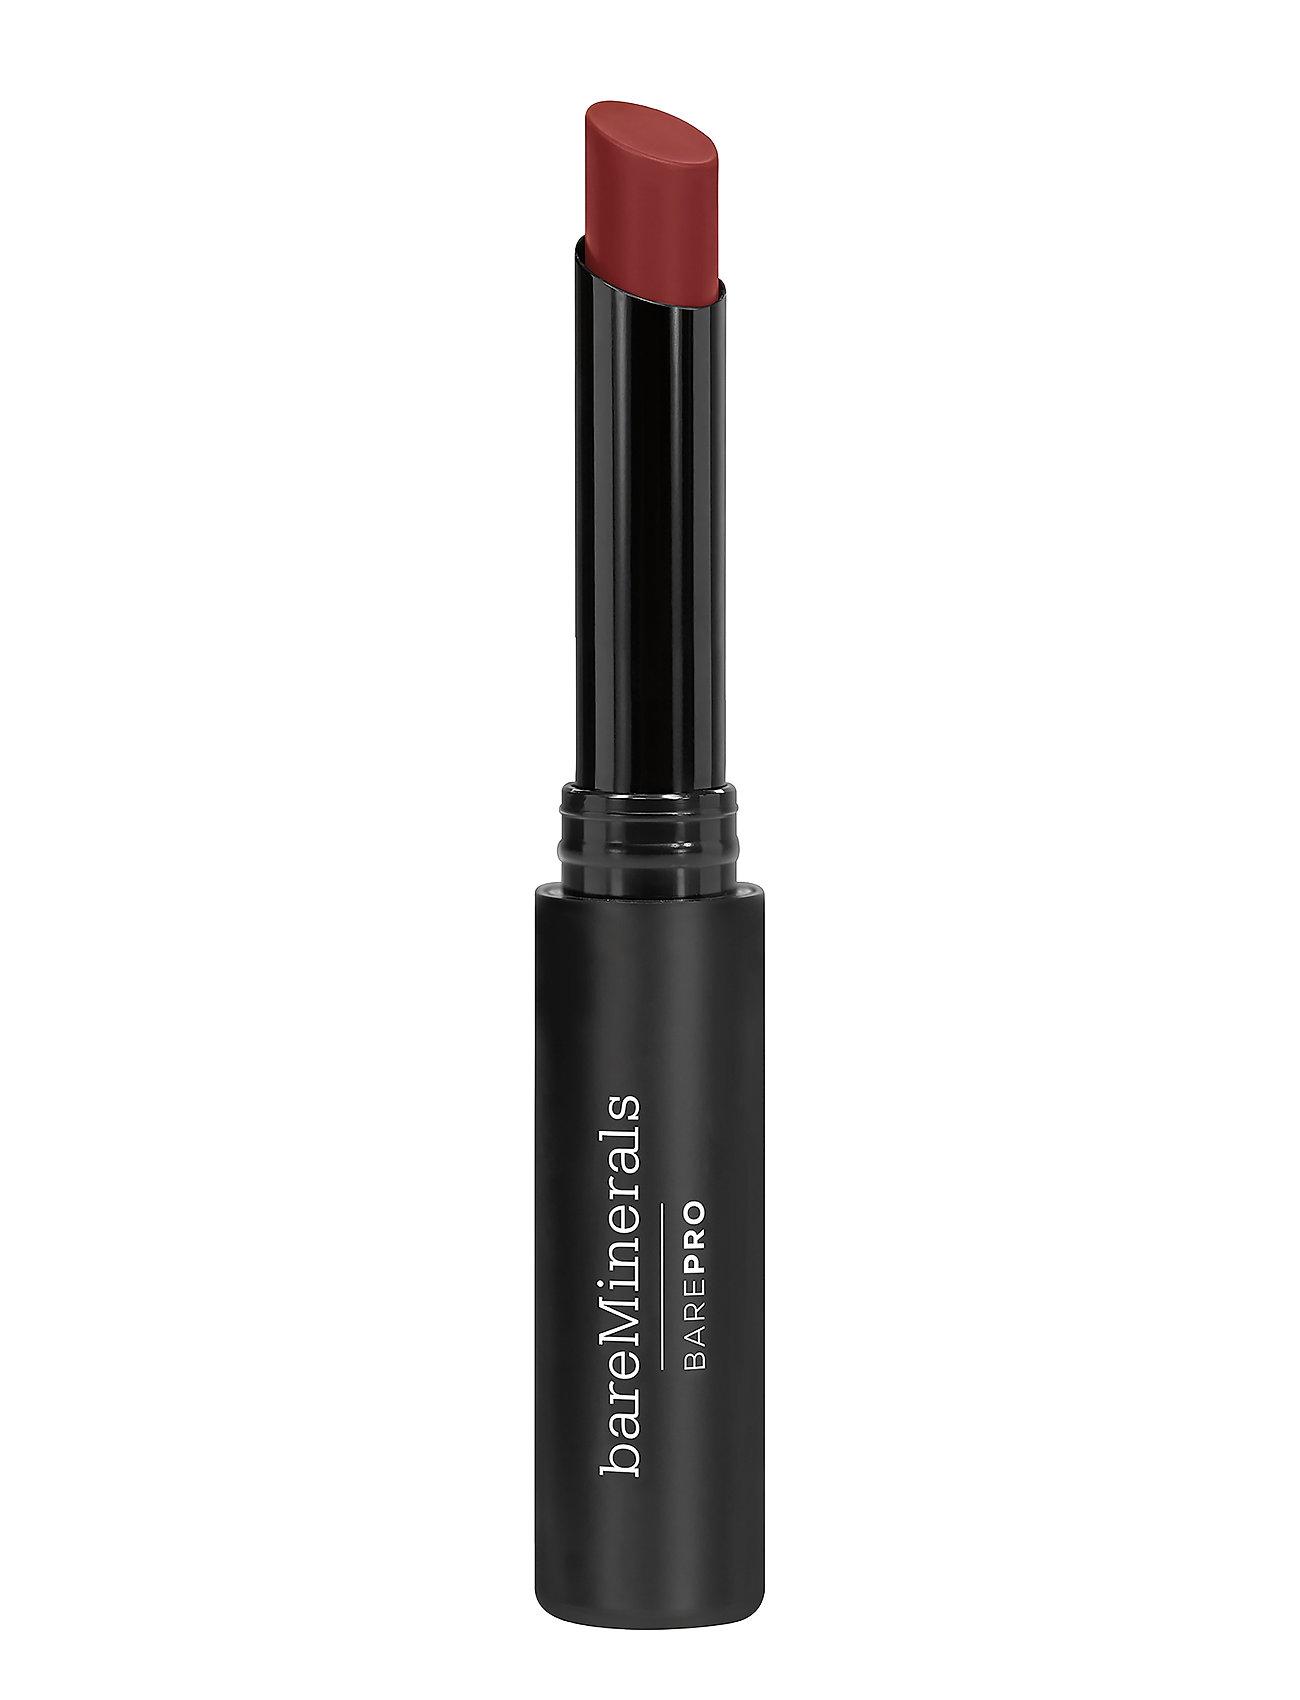 Image of Barepro Longwear Lipstick Nutmeg Læbestift Makeup Brun BareMinerals (3138616955)